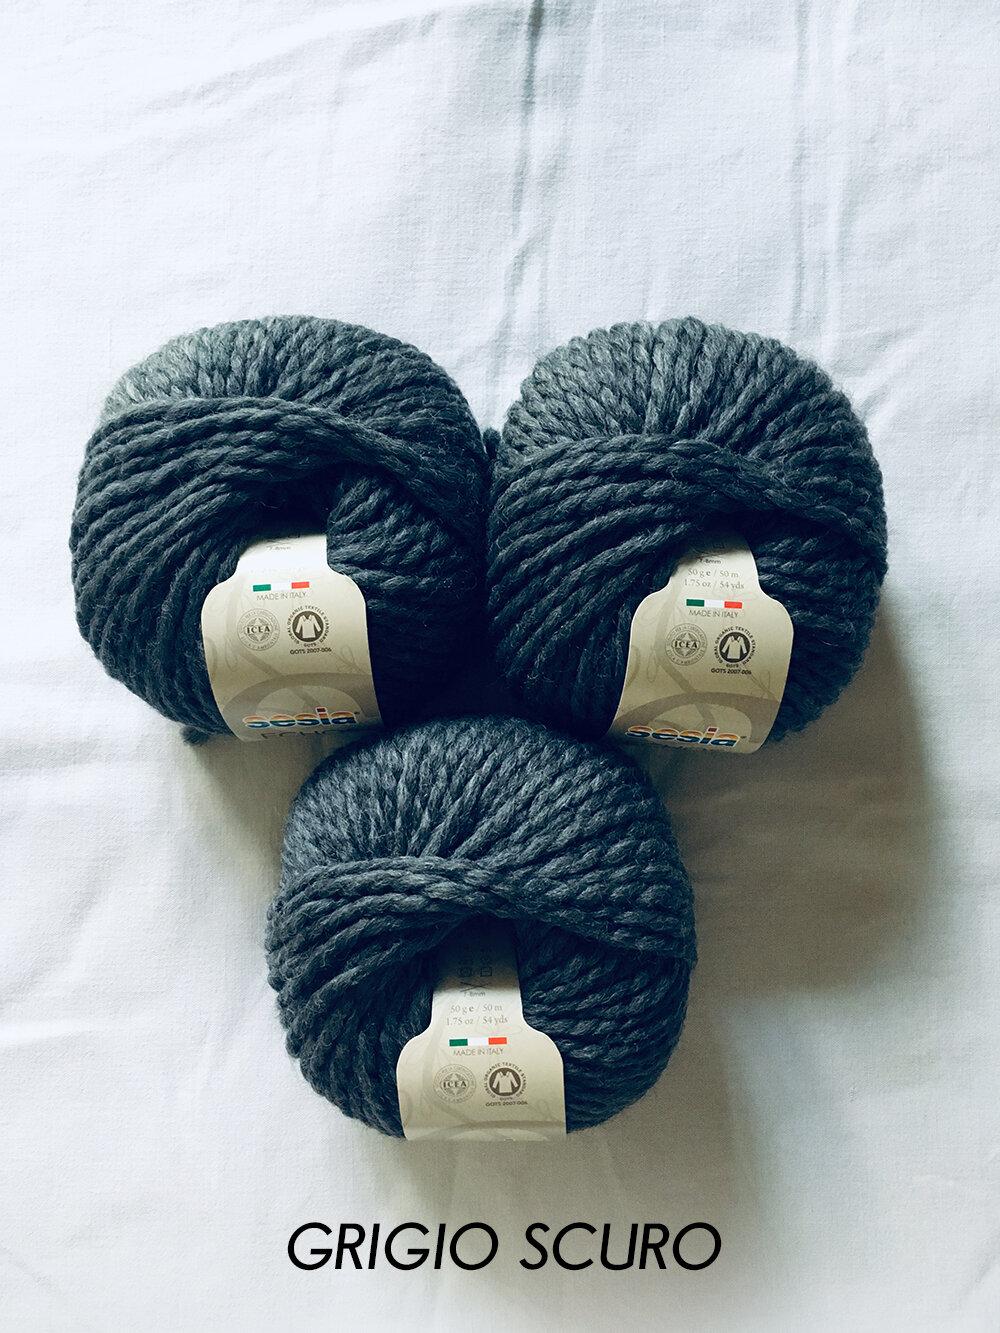 sesia_echos_grigio_scuro_461_wool_done_knitting.jpg